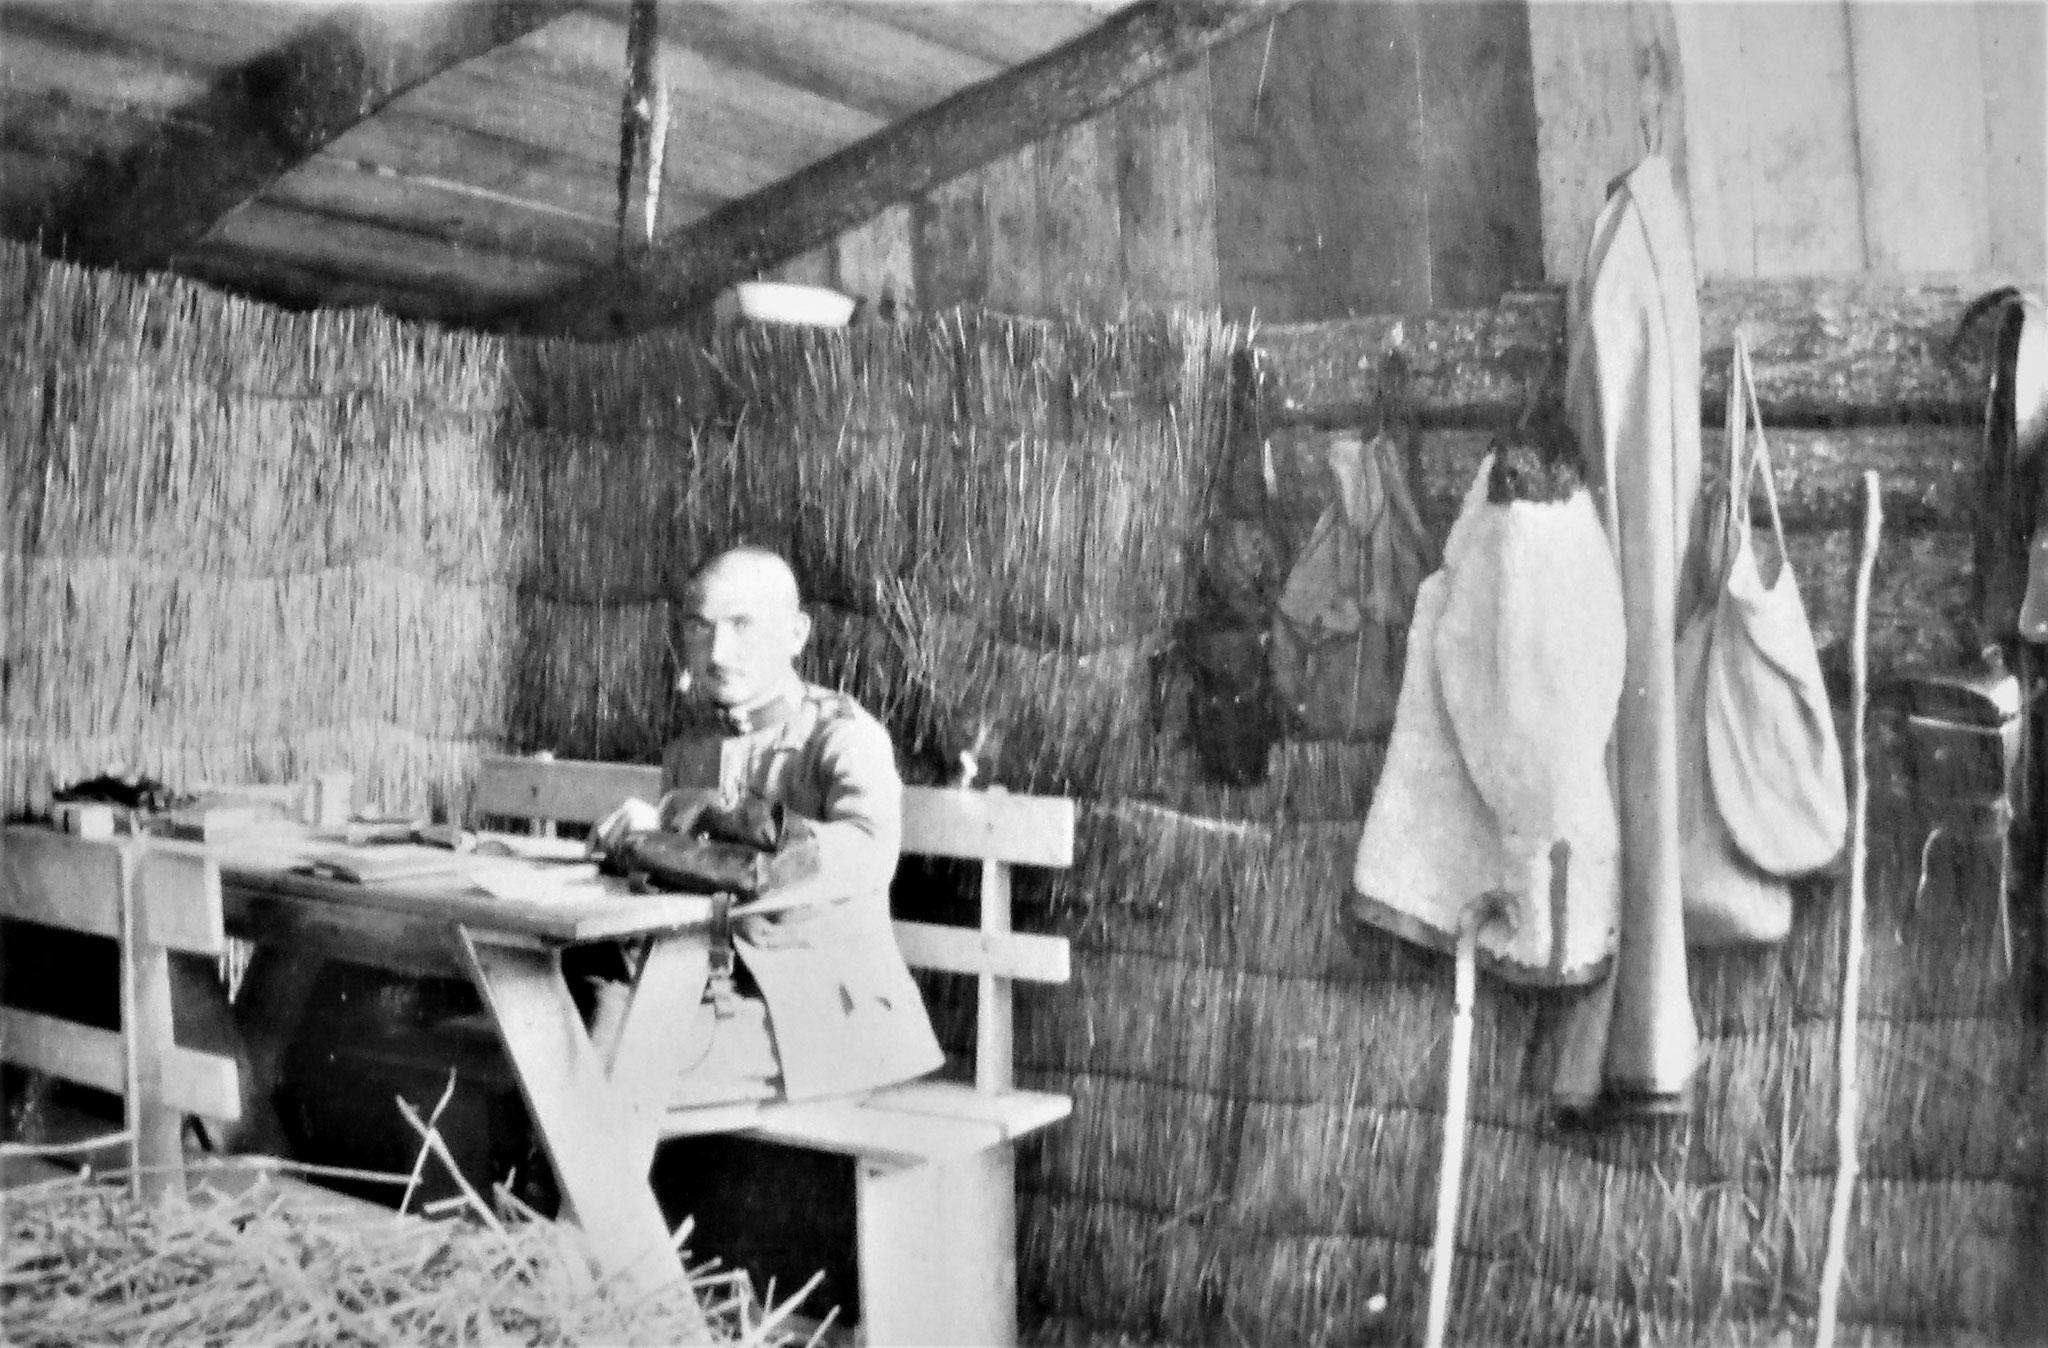 Penka im Offz-Unterstand der 1. Esk. Dnjestr nördl. Potoczyska 12. August 1915.